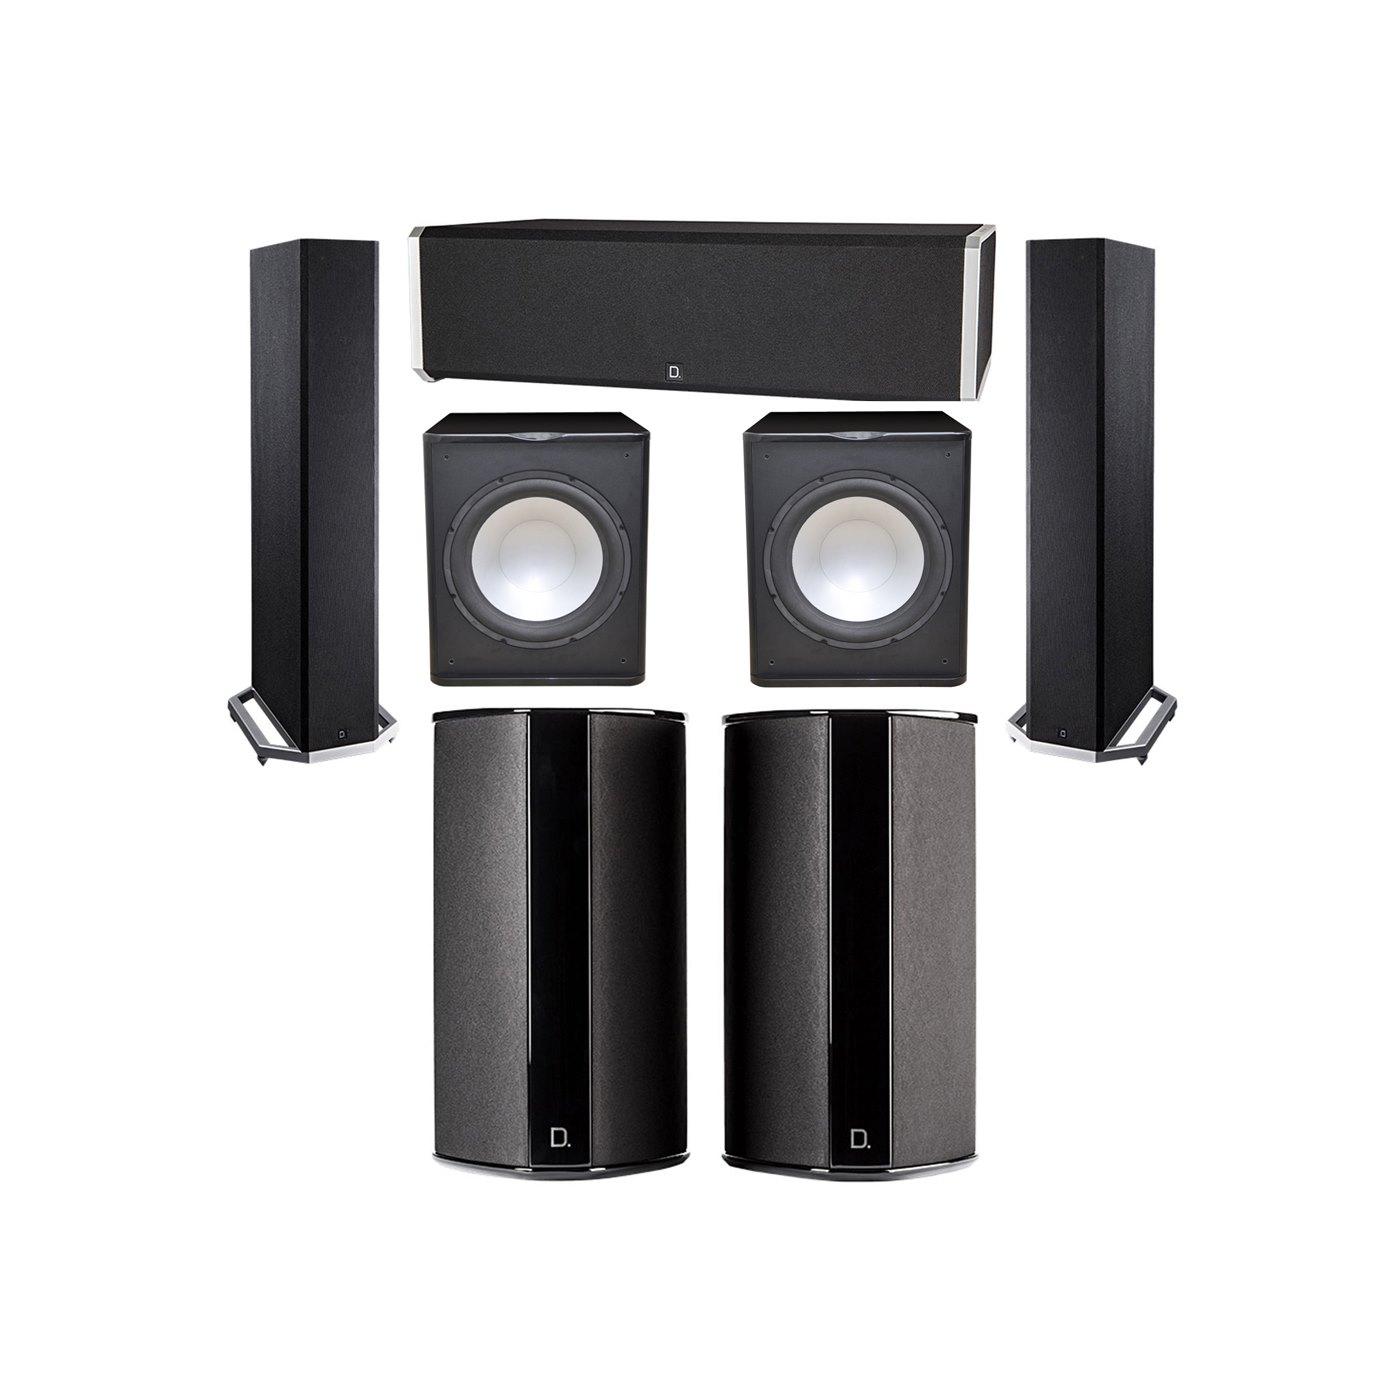 Definitive Technology 5.2 System with 2 BP9020 Tower Speakers, 1 CS9040 Center Channel Speaker, 2 SR9080 Surround Speaker, 2 Premier Acoustic PA-150 Subwoofer